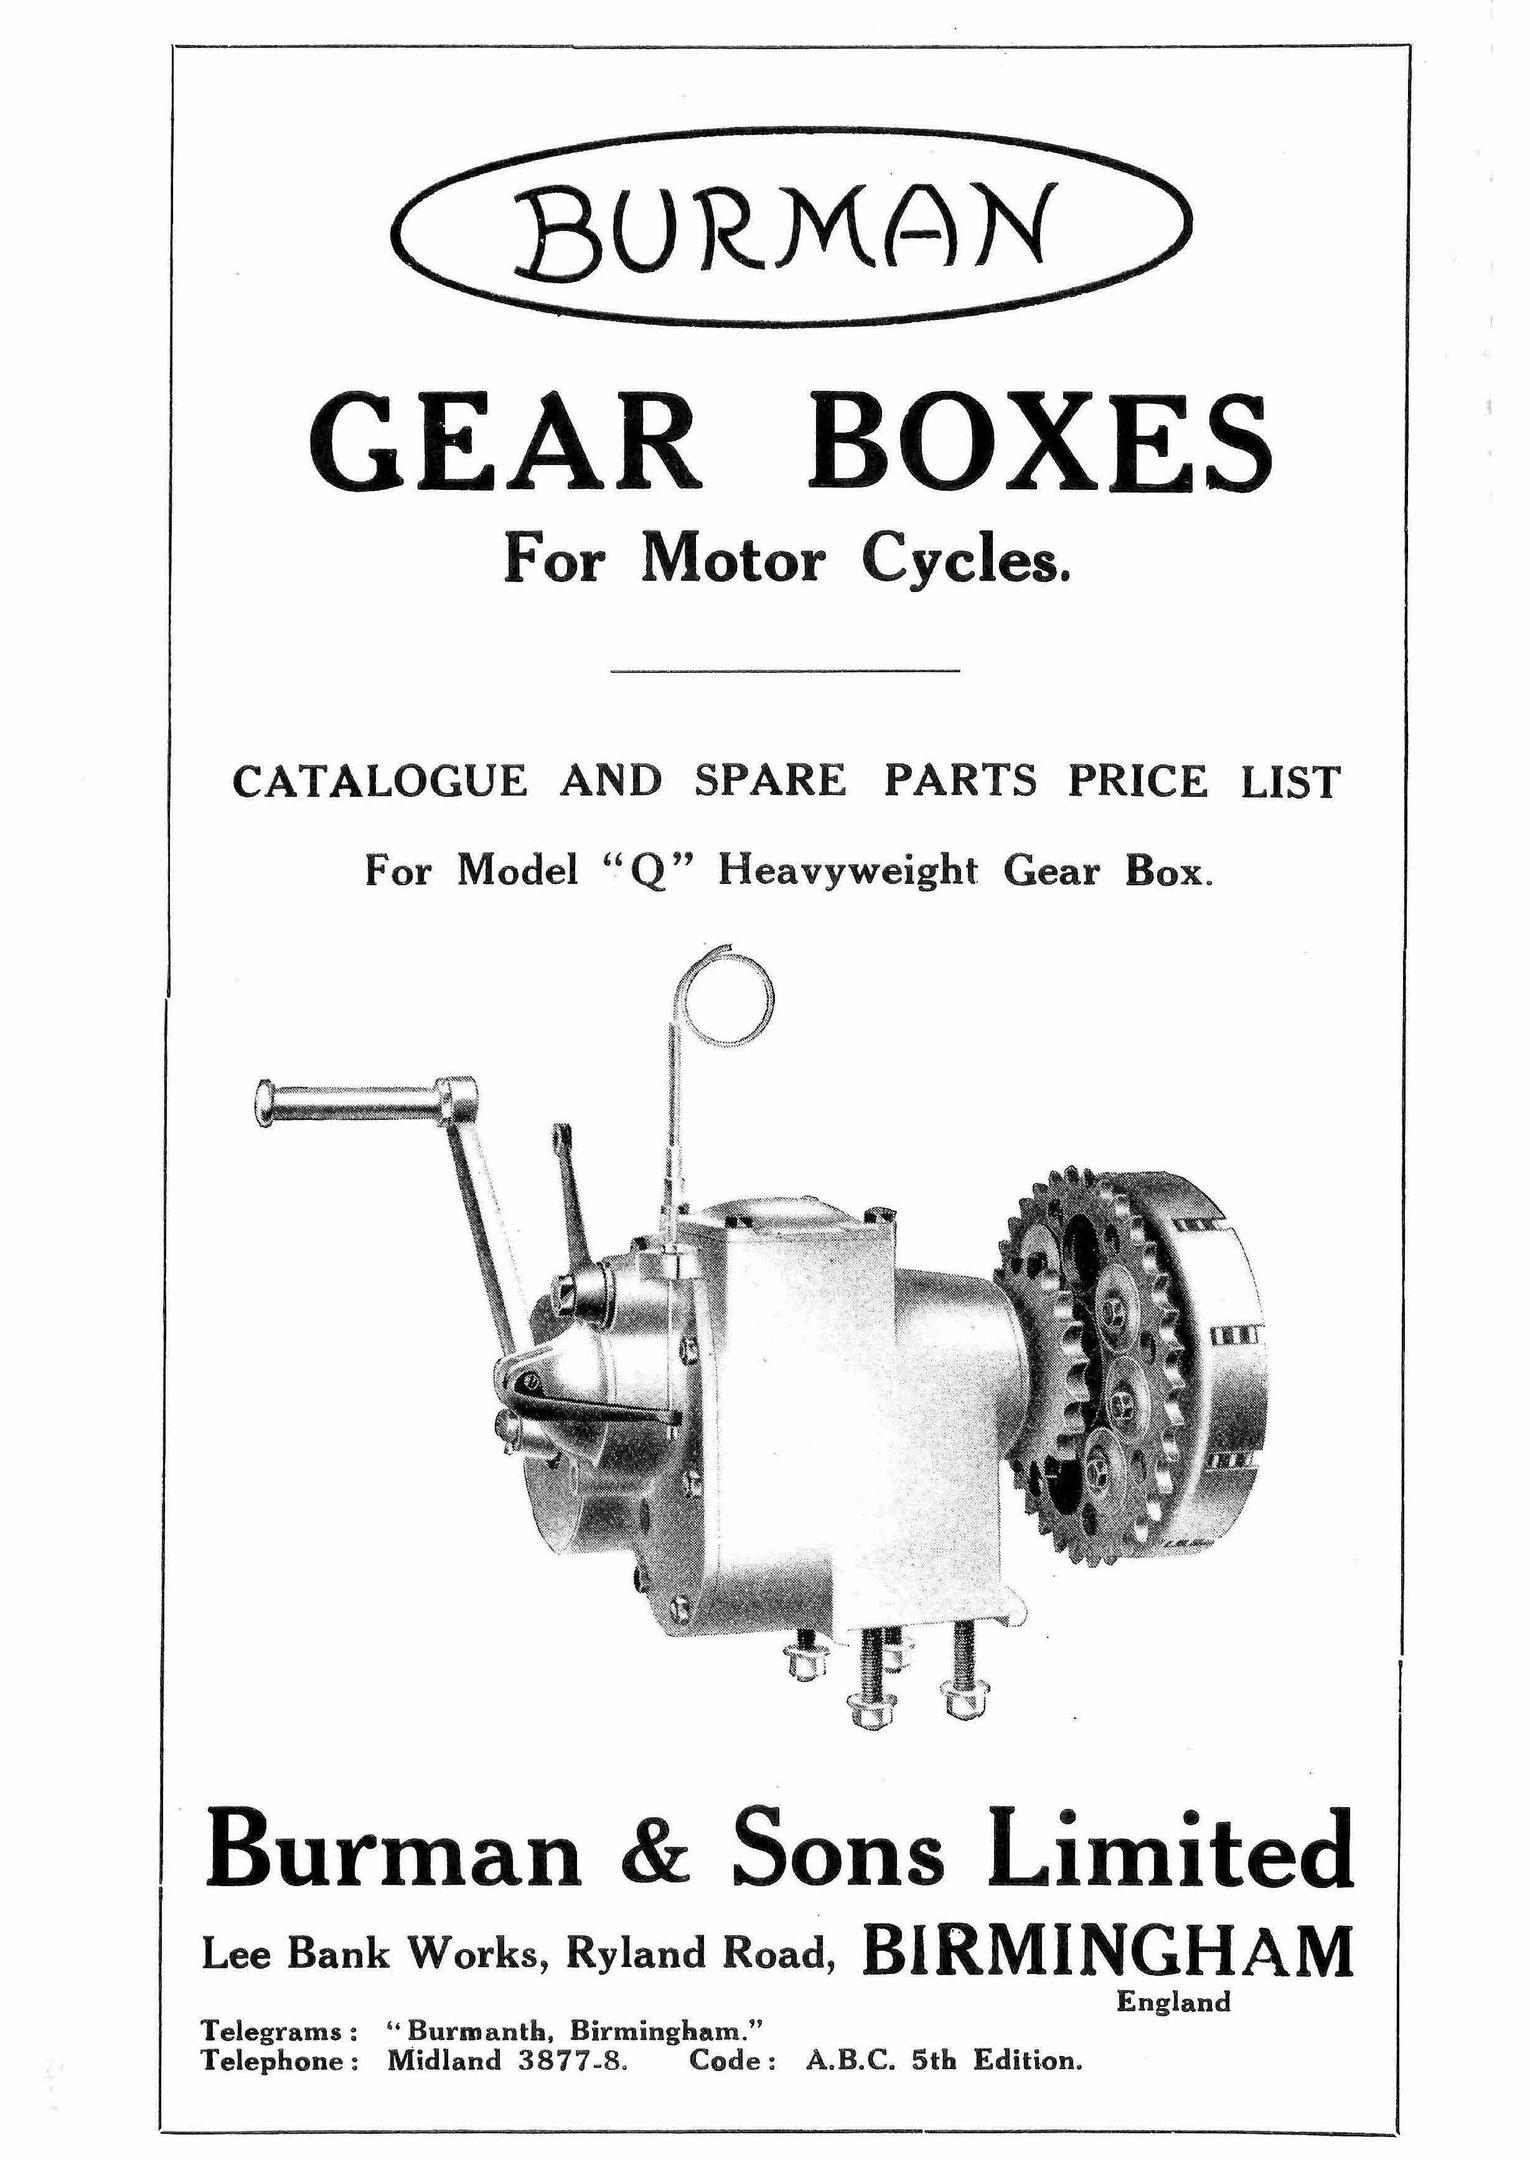 hight resolution of burman motorcycle gear box manuals themanualman mix gear box of motorcycle 19